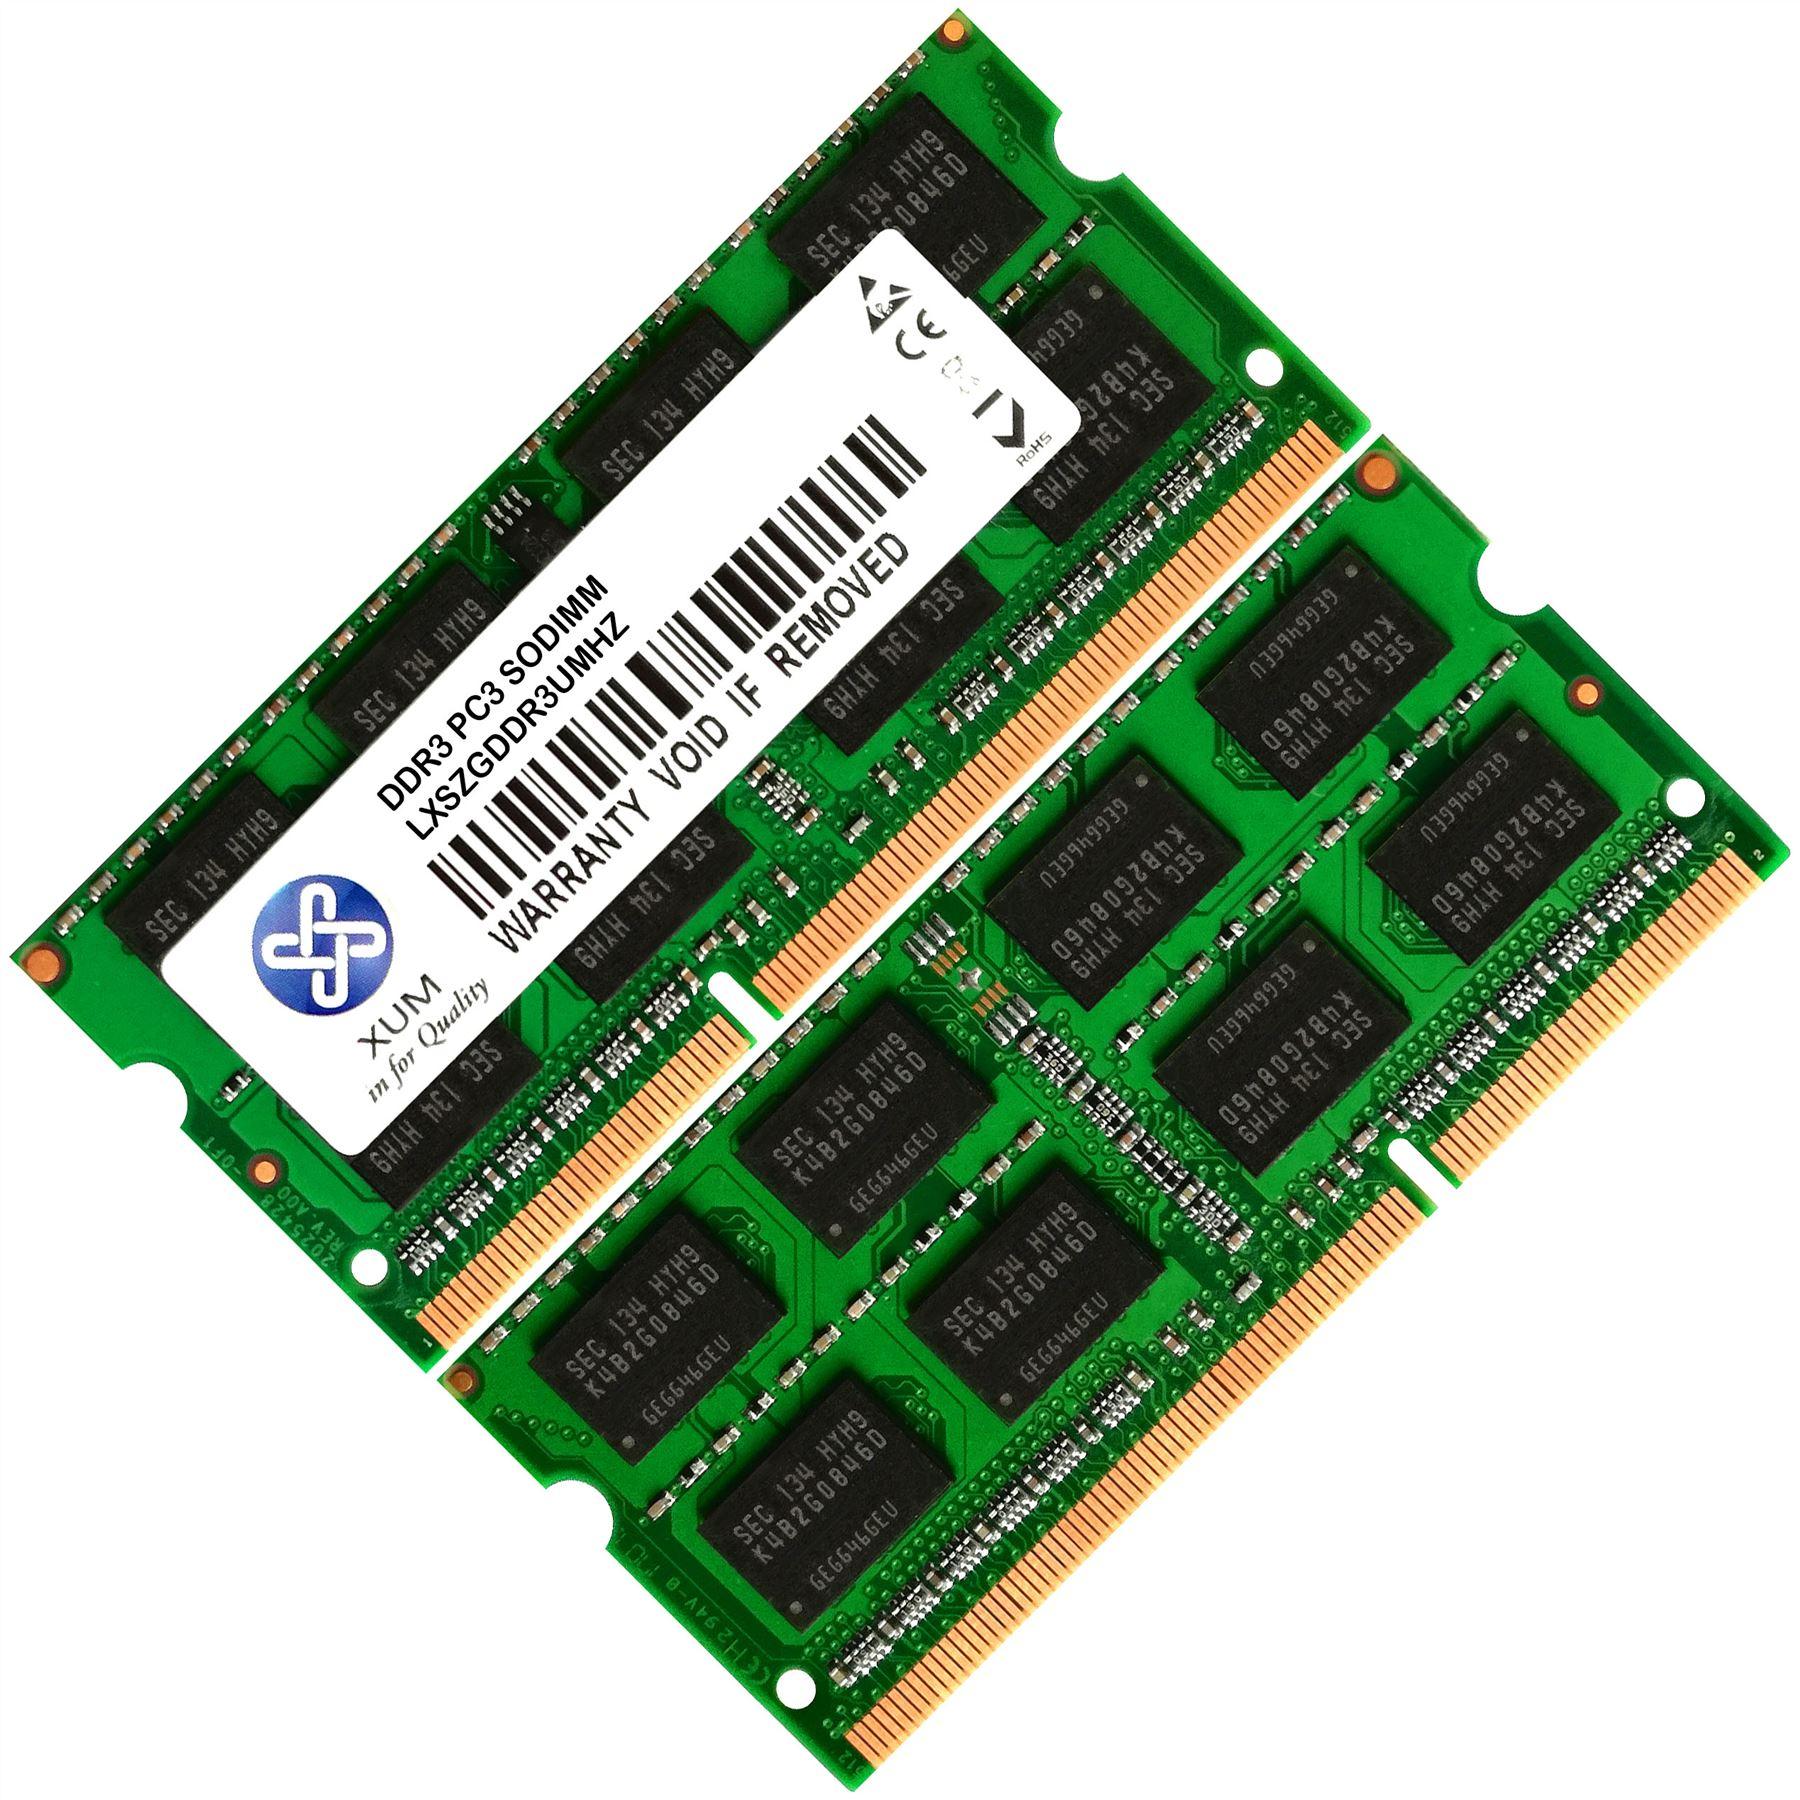 Memoria-Ram-Toshiba-Satellite-Laptop-C50-B-18K-C50-B-190-Nuevo-Lot-DDR3-SDRAM